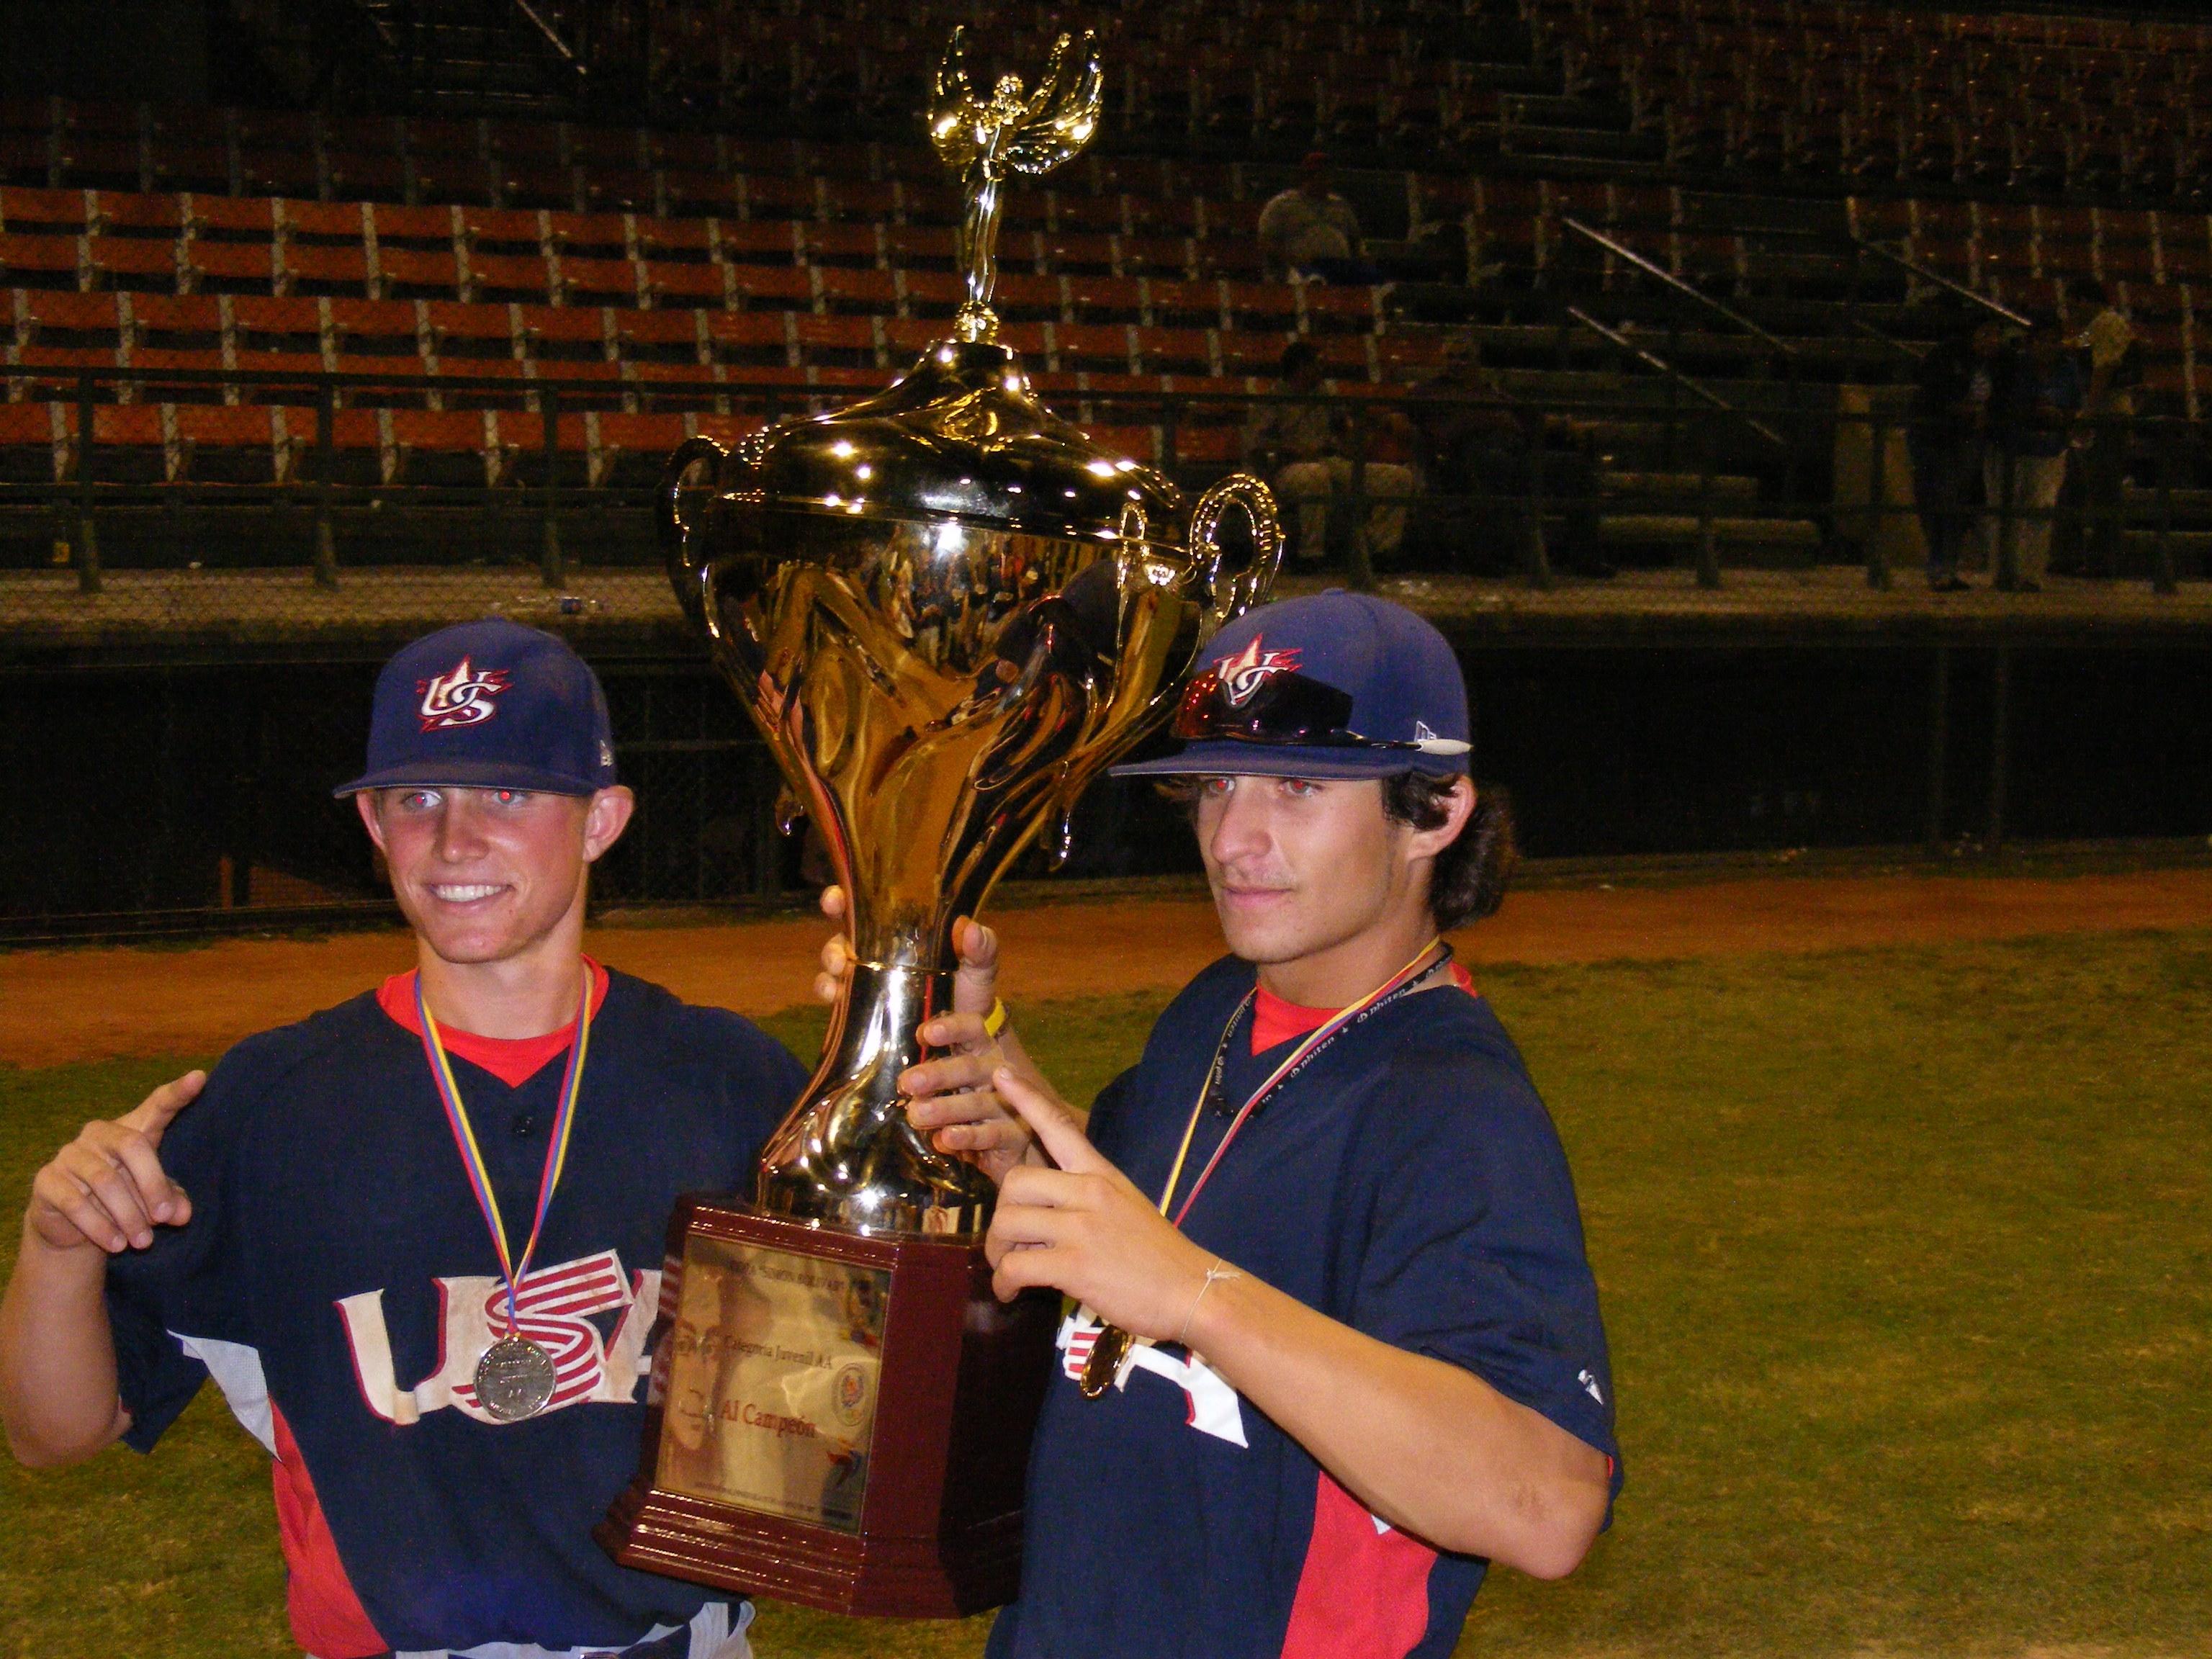 Stassi & Aplin 2007.JPG